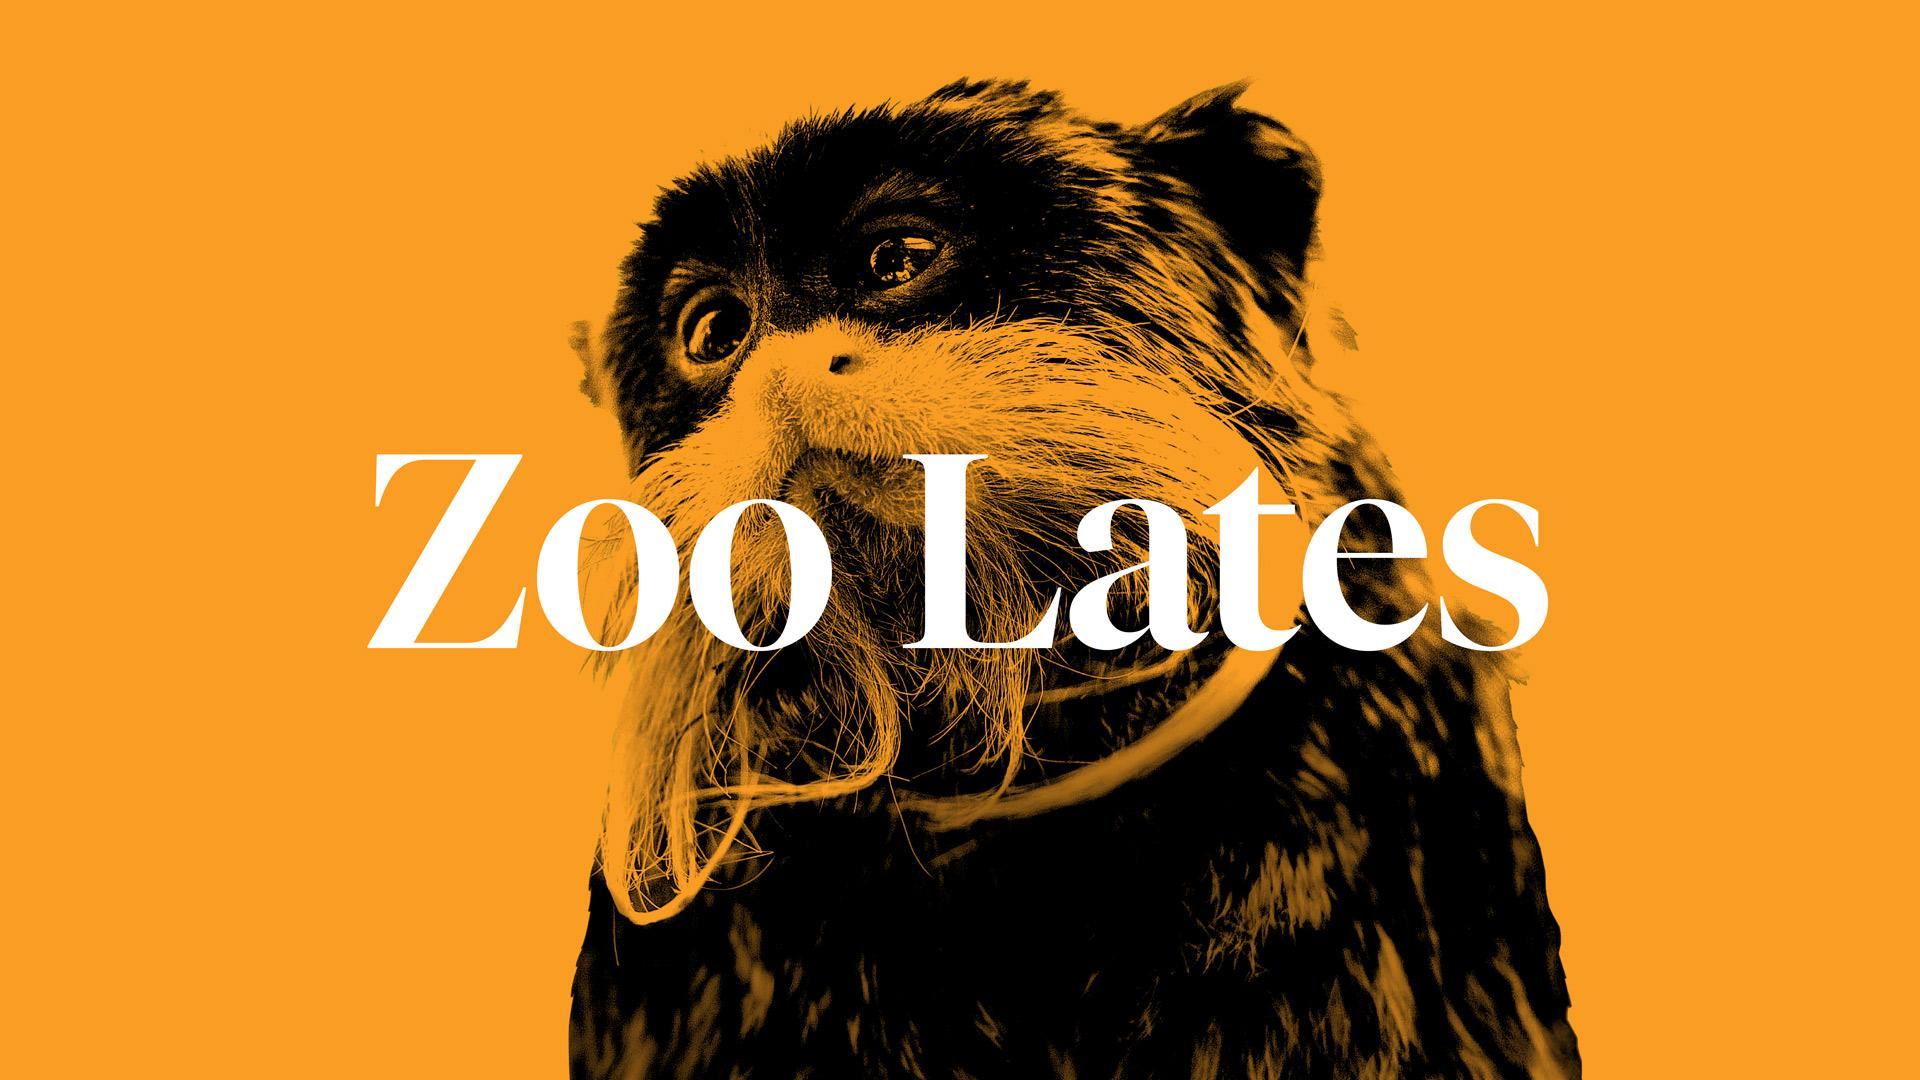 https://rfacdn.nz/zoo/assets/media/zoo-lates-homepage.jpg